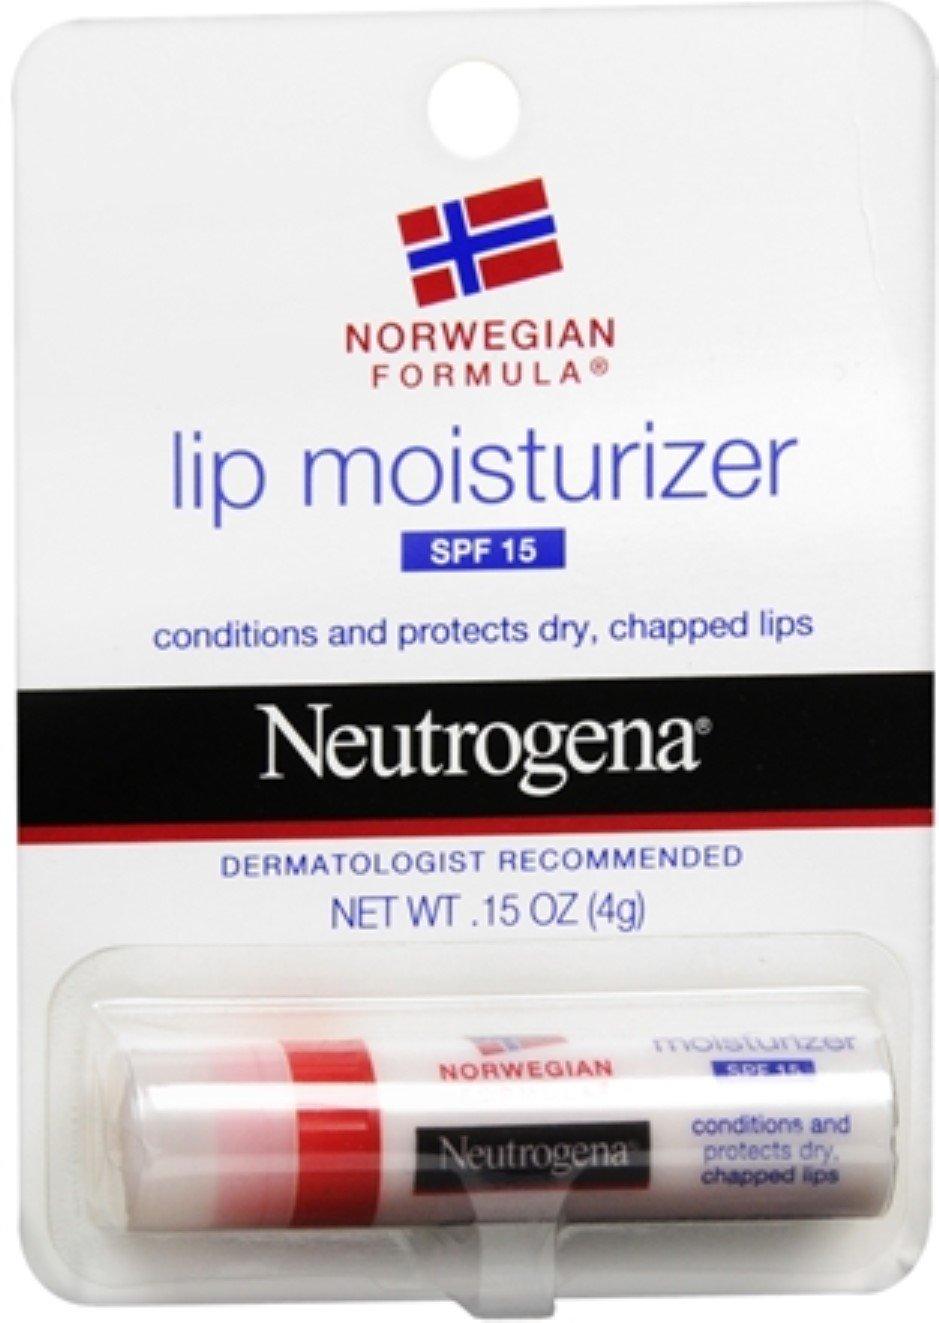 Neutrogena Lip Moisturizer SPF 15 0.15 oz (Pack of 10)